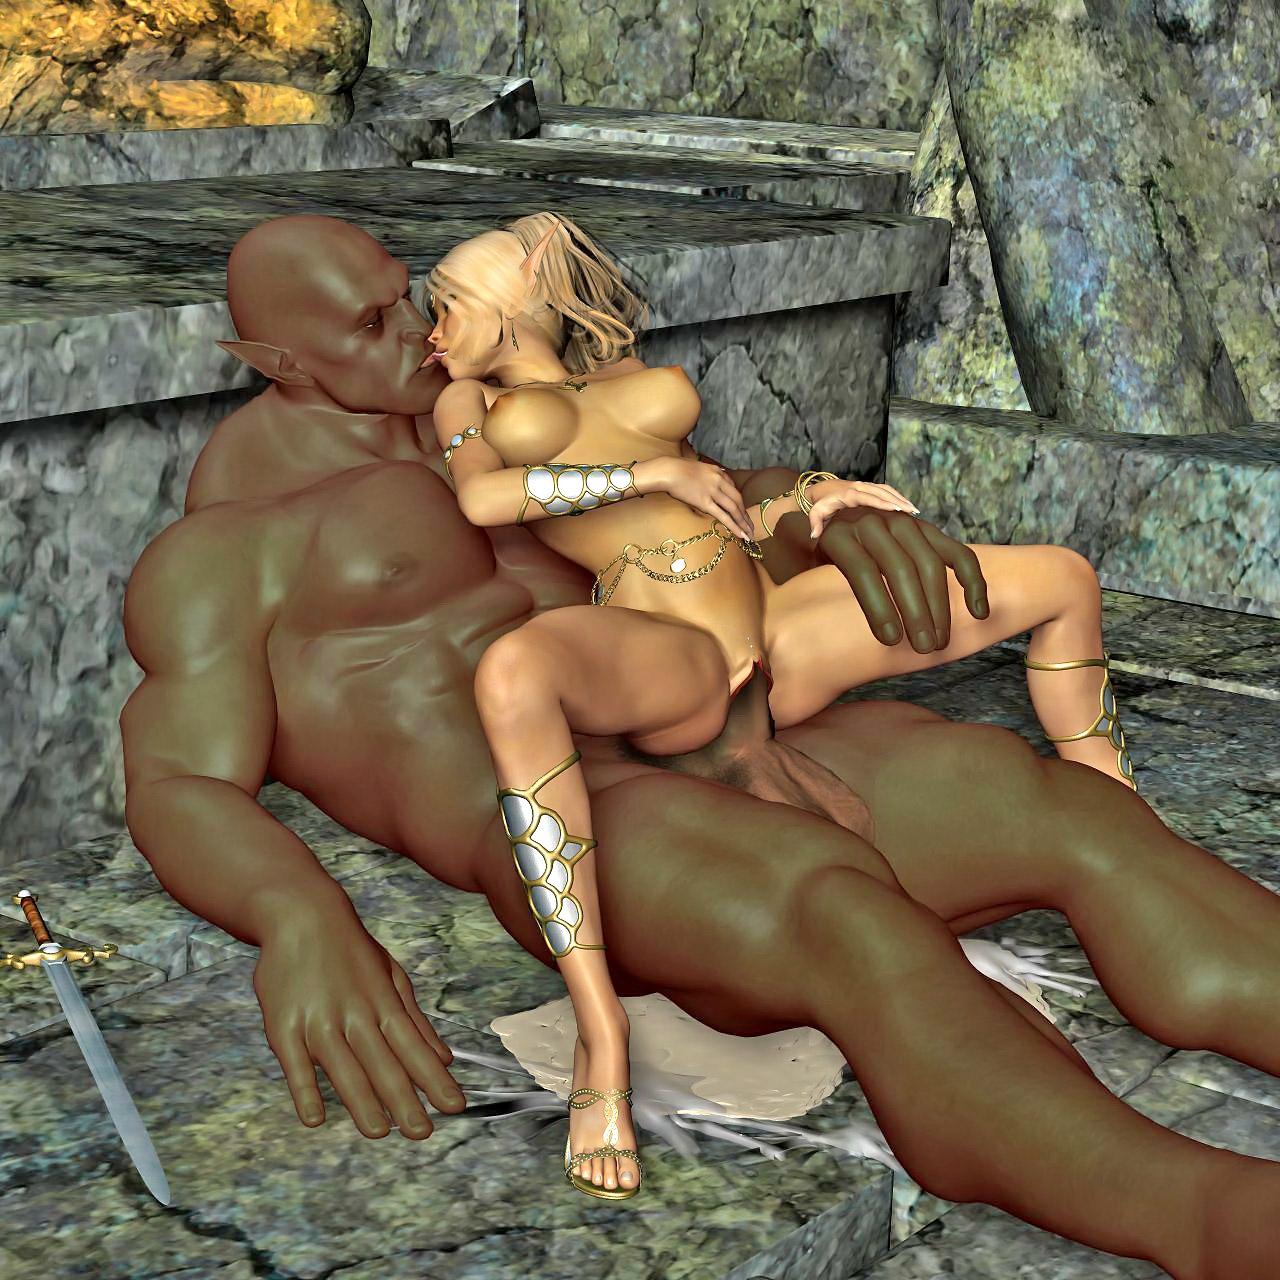 Pic gallery sex villa pics erotic clips